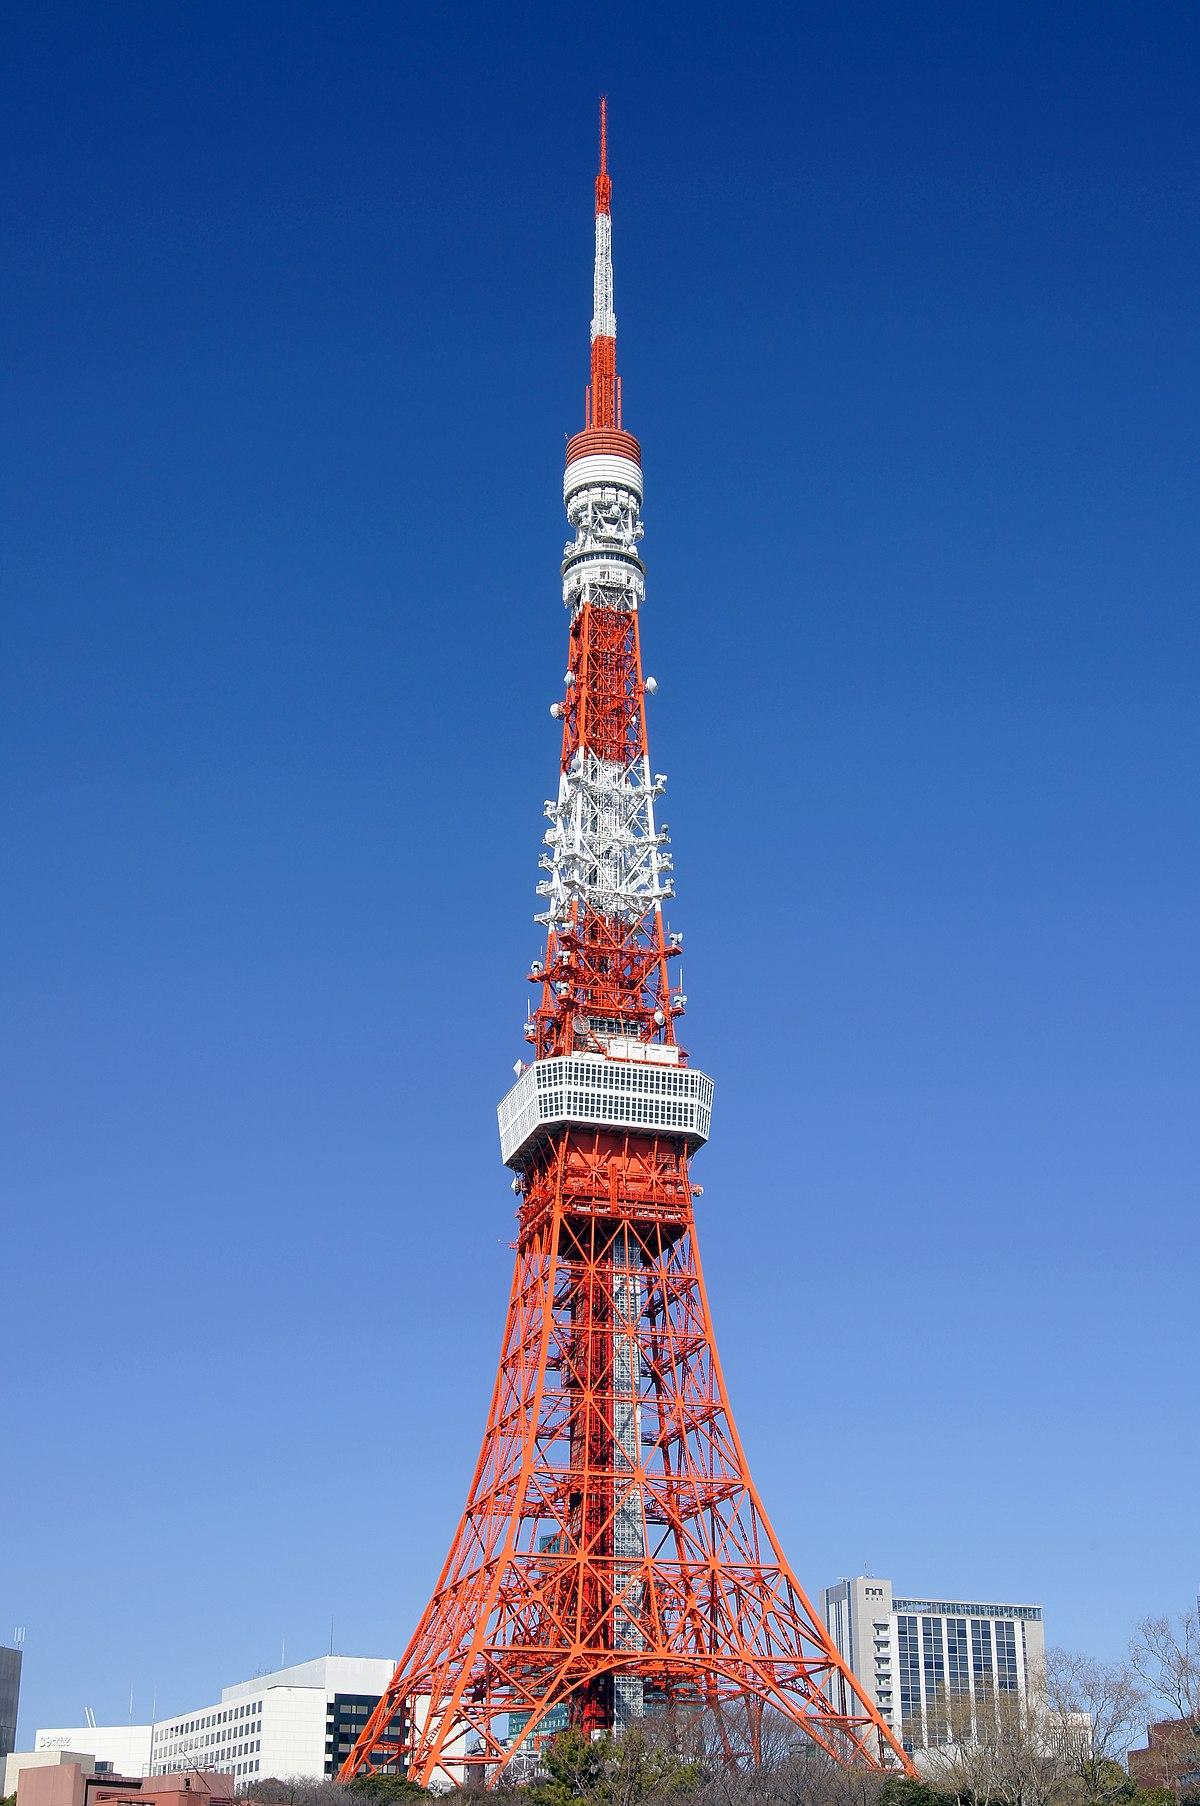 tokyo tower wikipedia. Black Bedroom Furniture Sets. Home Design Ideas